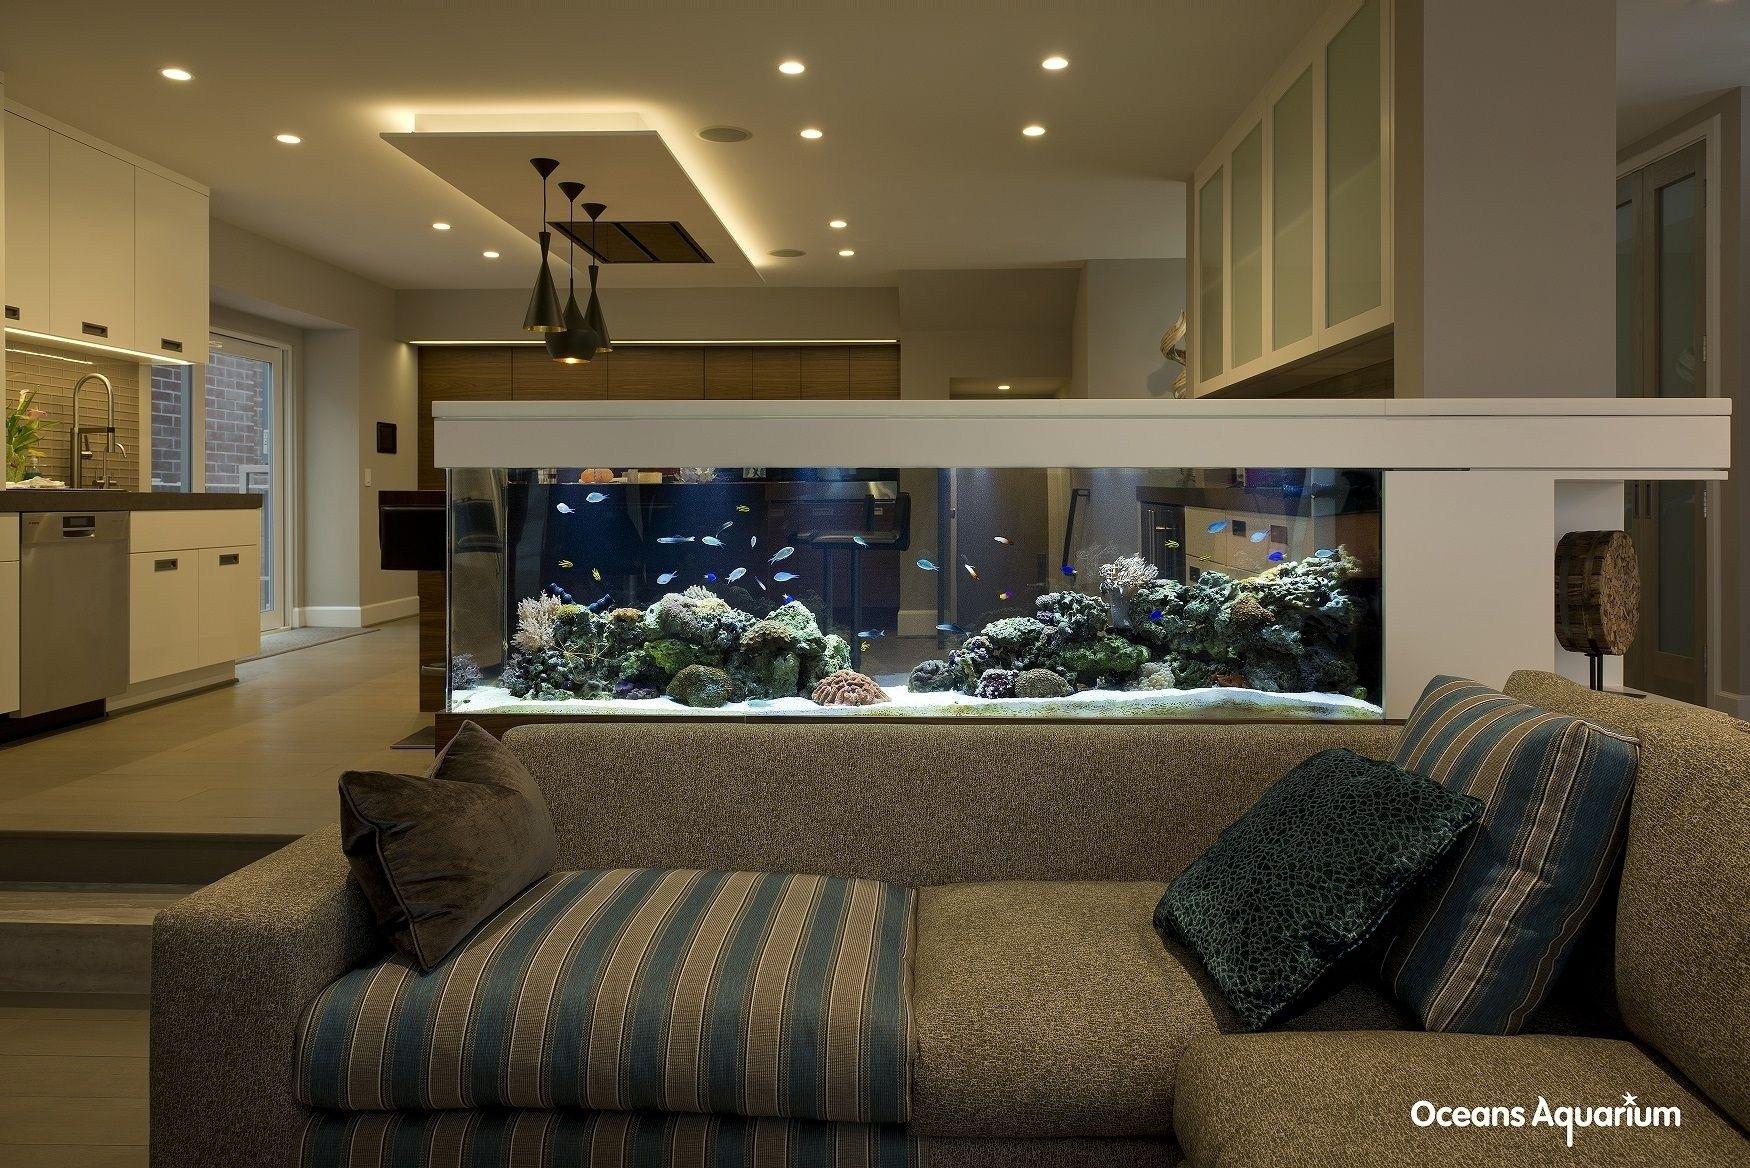 Pin By Srike On Home Aquarium In 2020 Amazing Aquariums